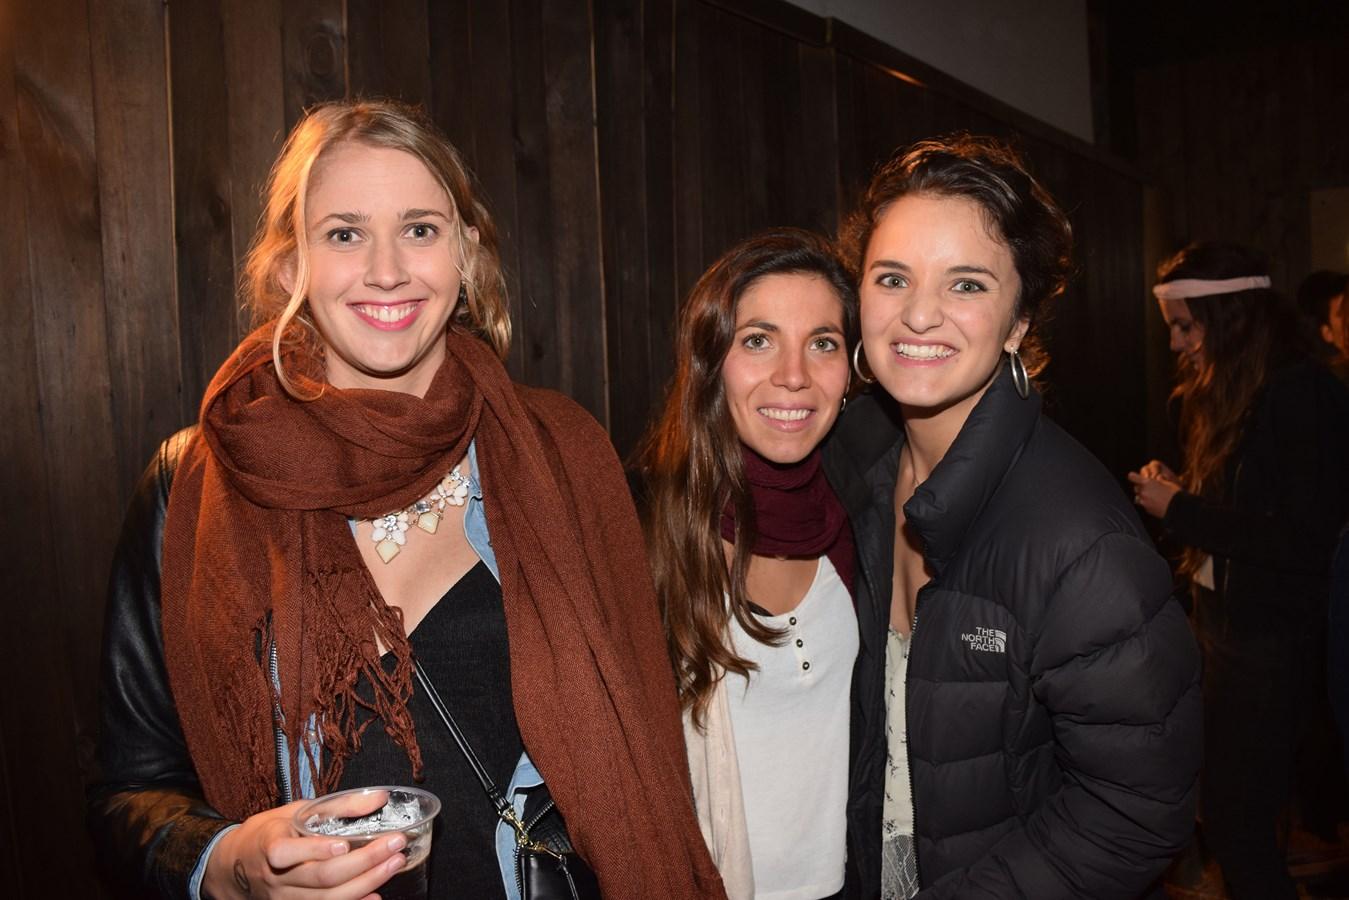 Camille Du Plessis, Sofía Eskenazi y Paula Cruzat.